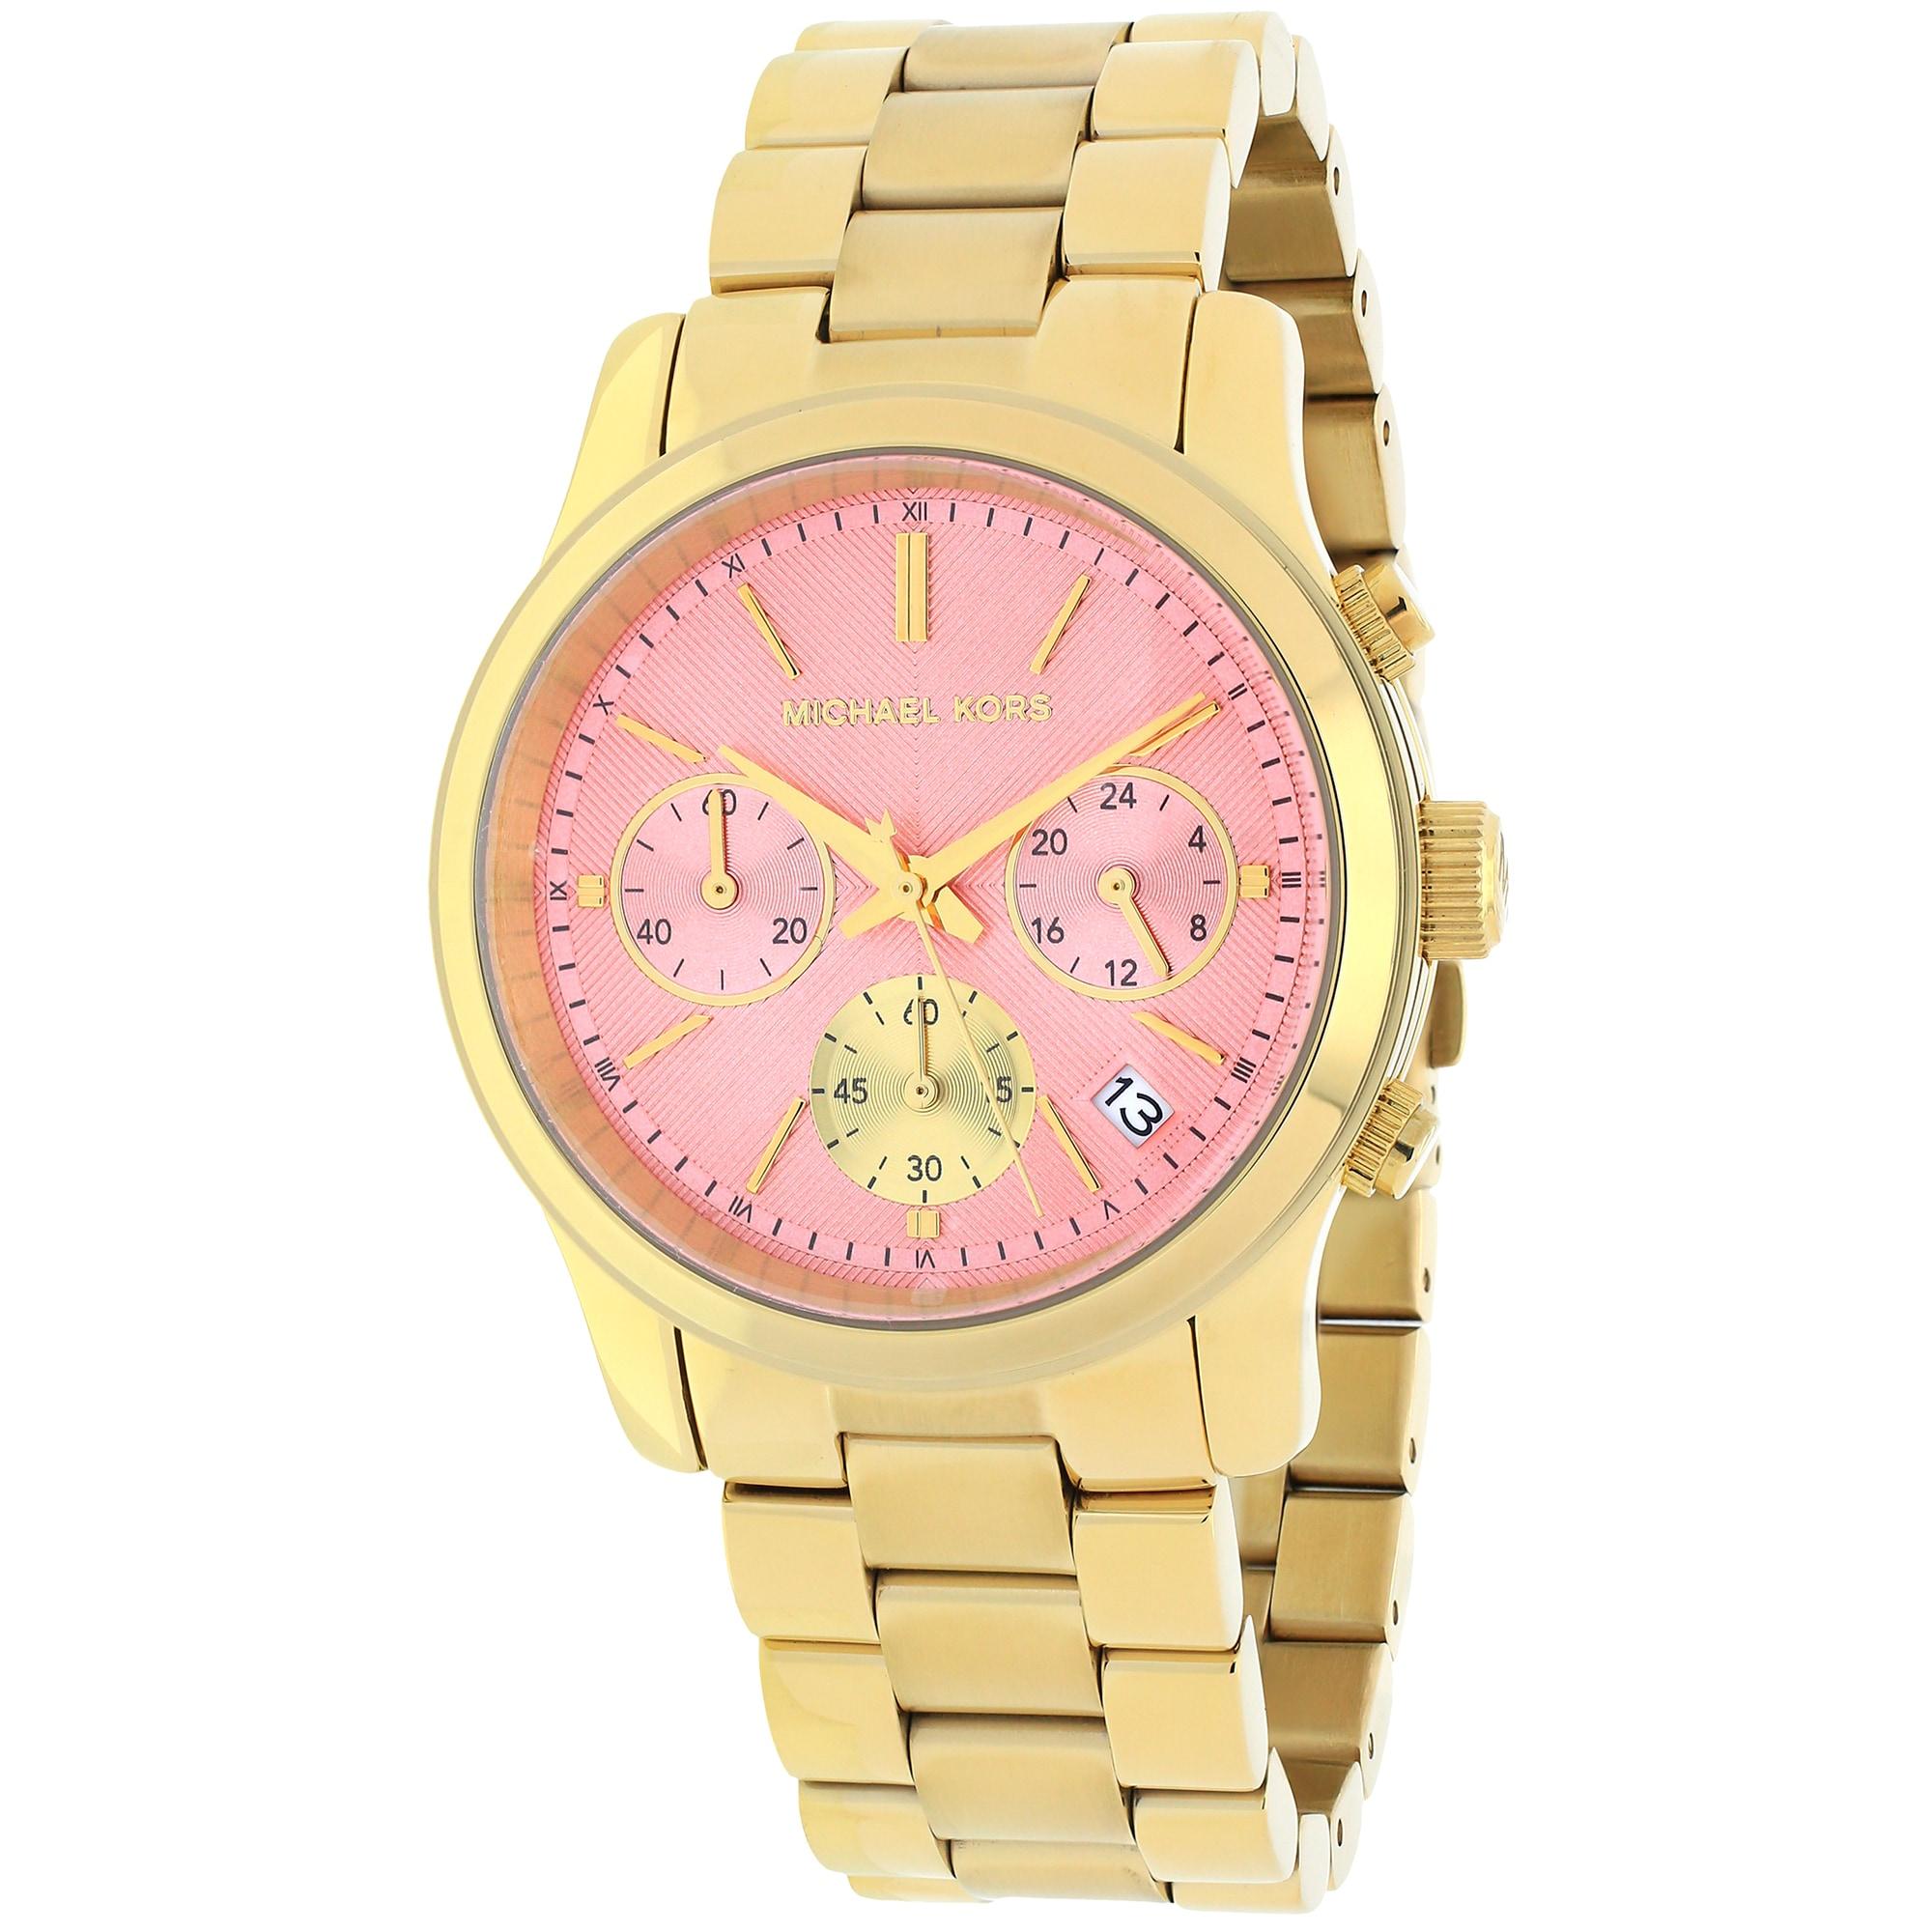 2868fe3e381 Shop Michael Kors Women s MK6161 Runway Round Goldtone Bracelet Watch -  Free Shipping Today - Overstock - 10183112